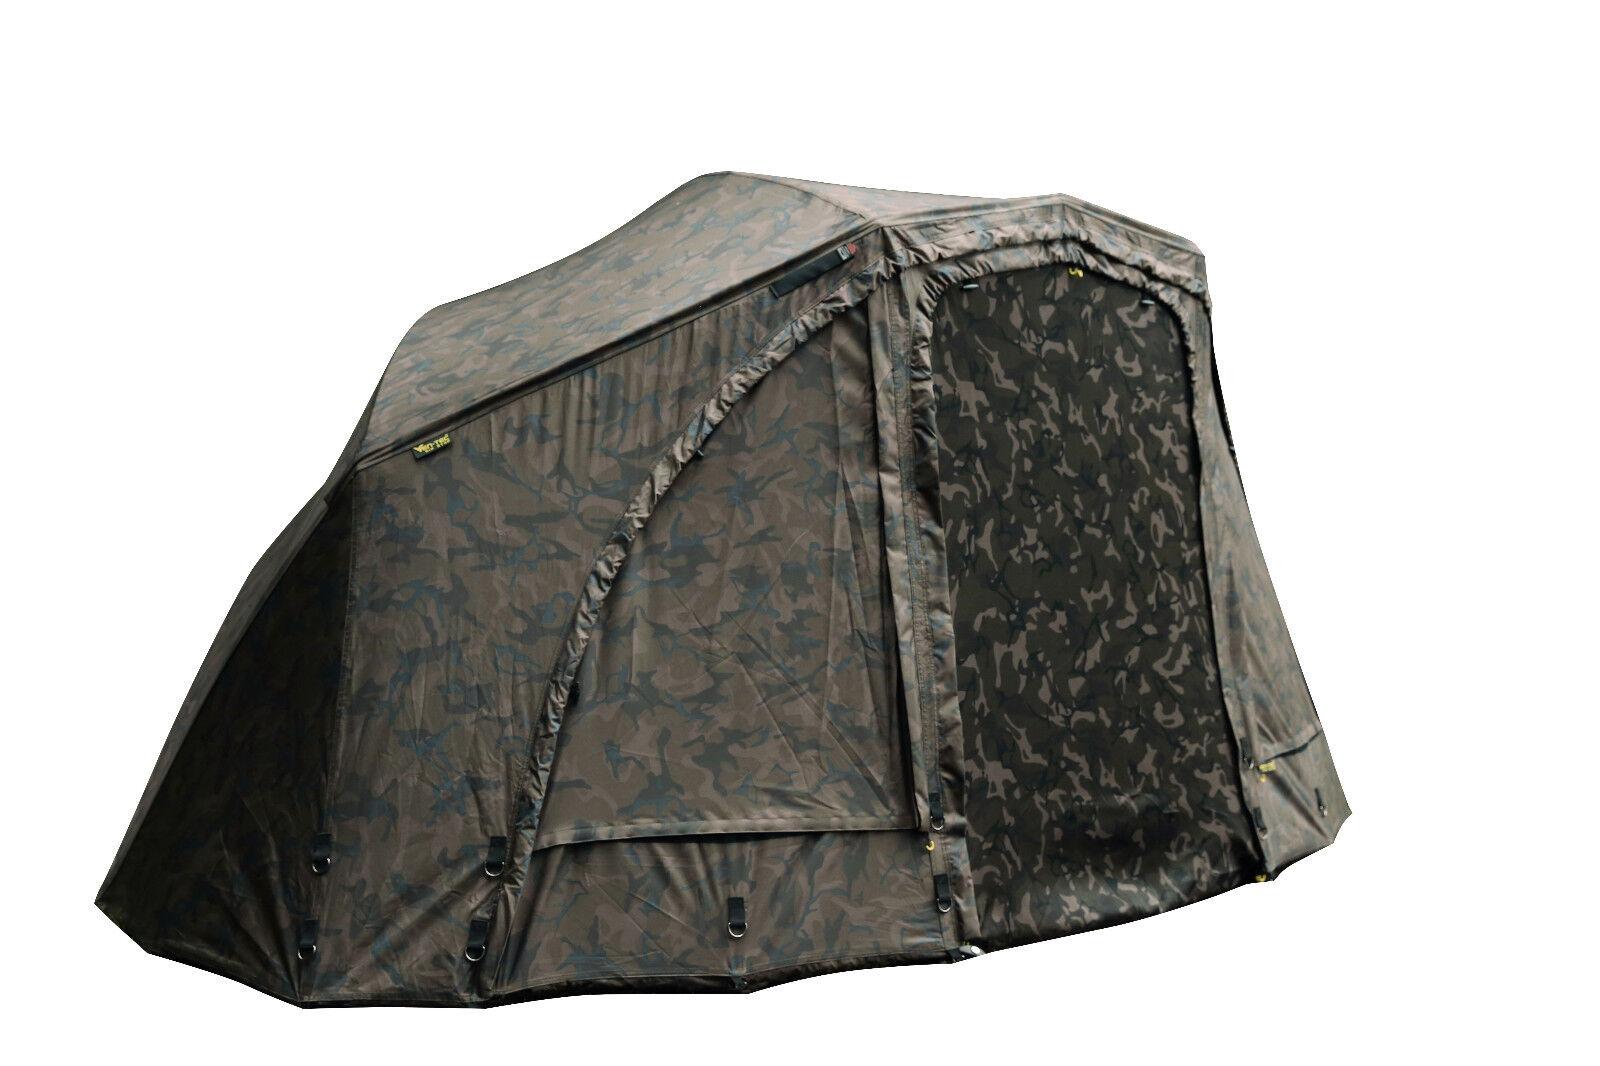 Fox Ultra 60 Camo Brolly System Ventec Schirmzelt komplett Schirm Karpfenangeln